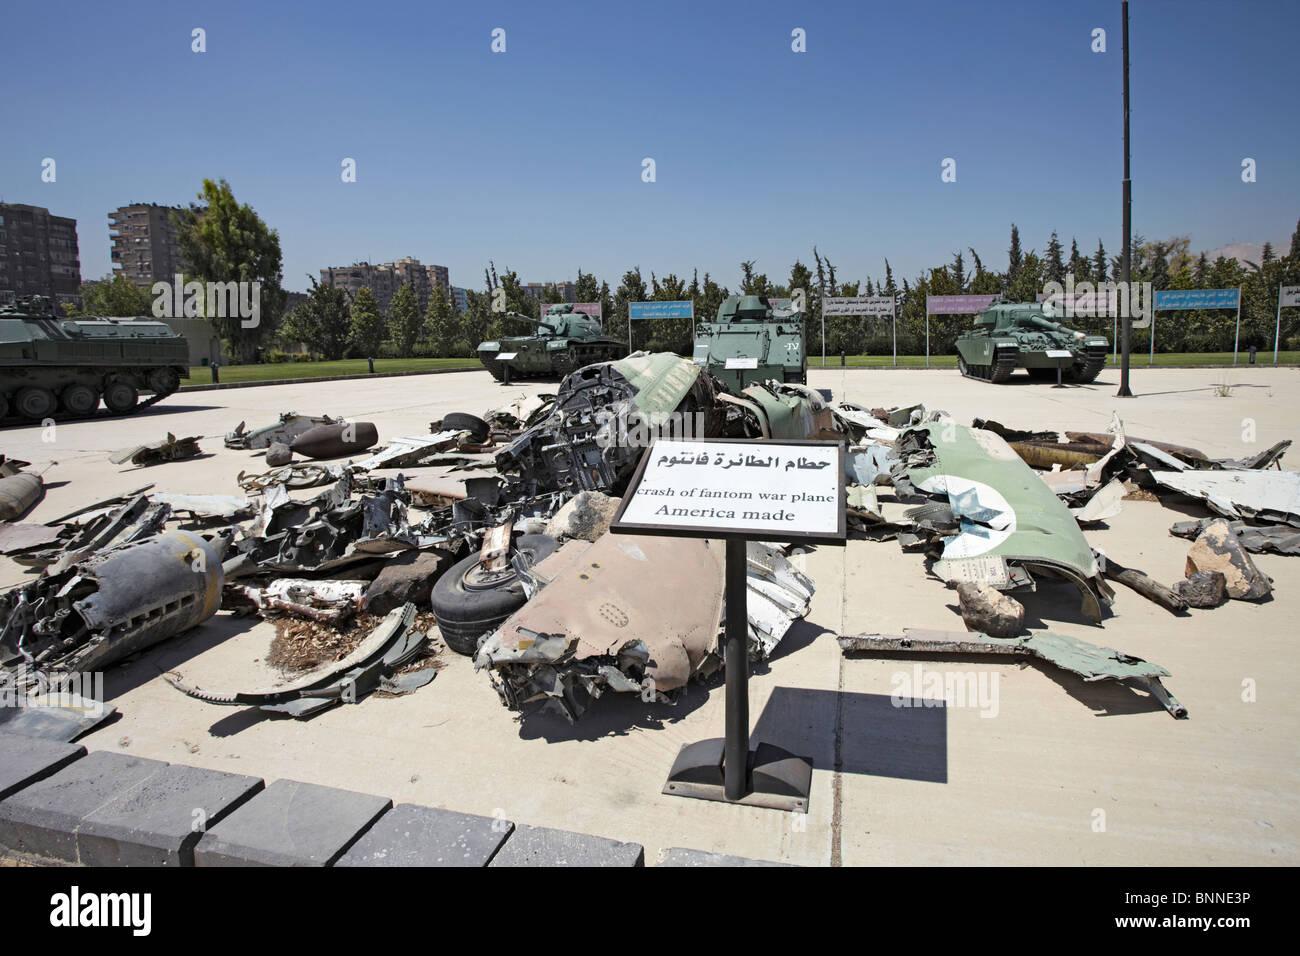 syria-damascus-panorama-military-museum-